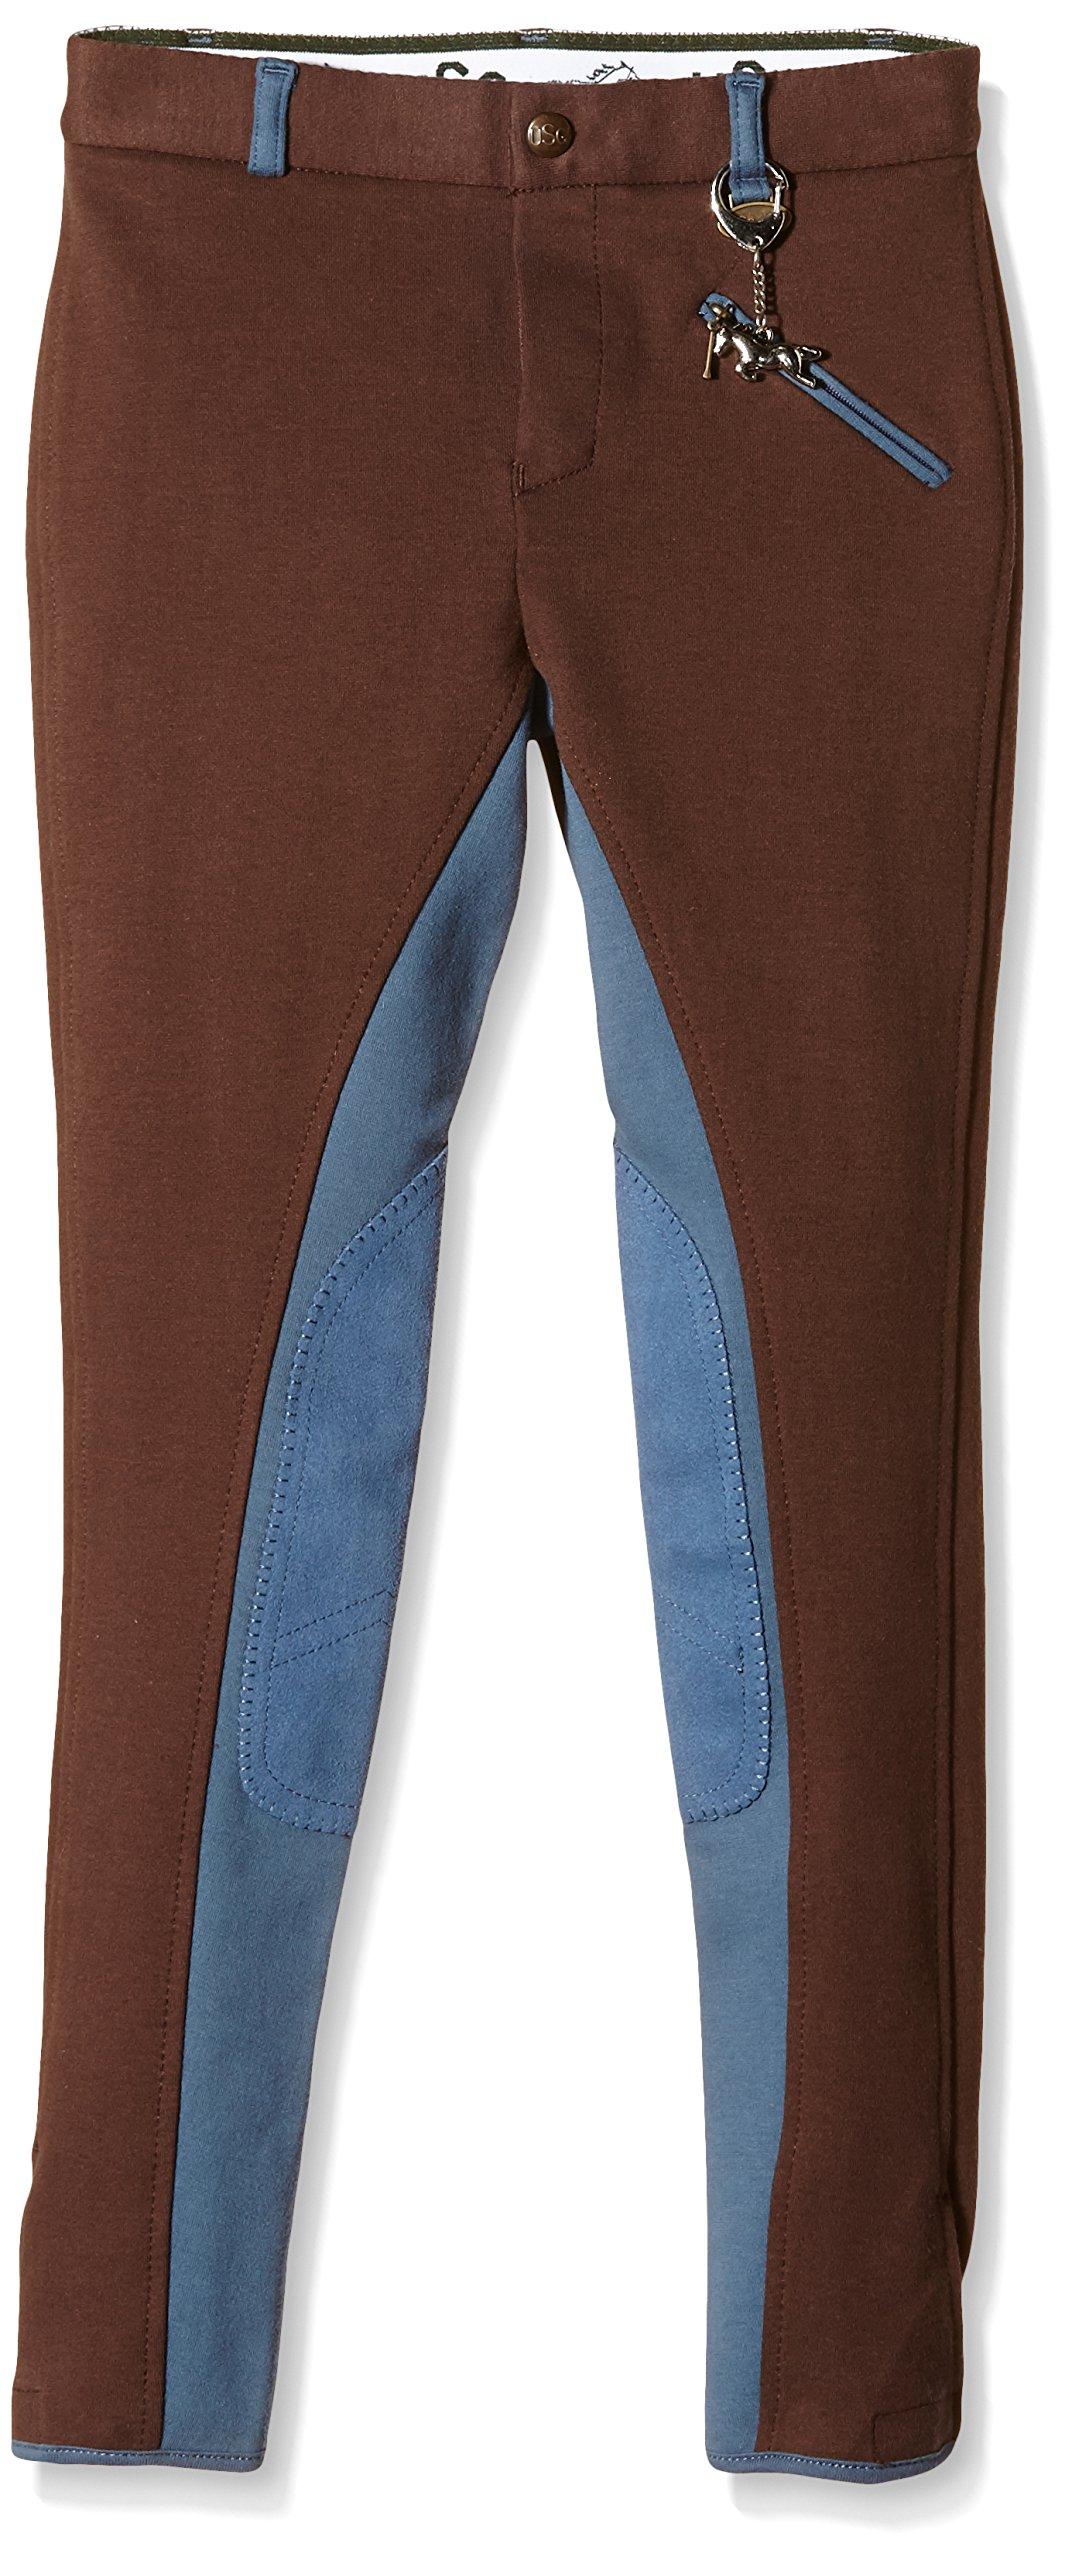 USG United Sportproducts, Pantaloni da equitazione Bambino Miley, Marrone (Braun/Rauchblau), 134 cm